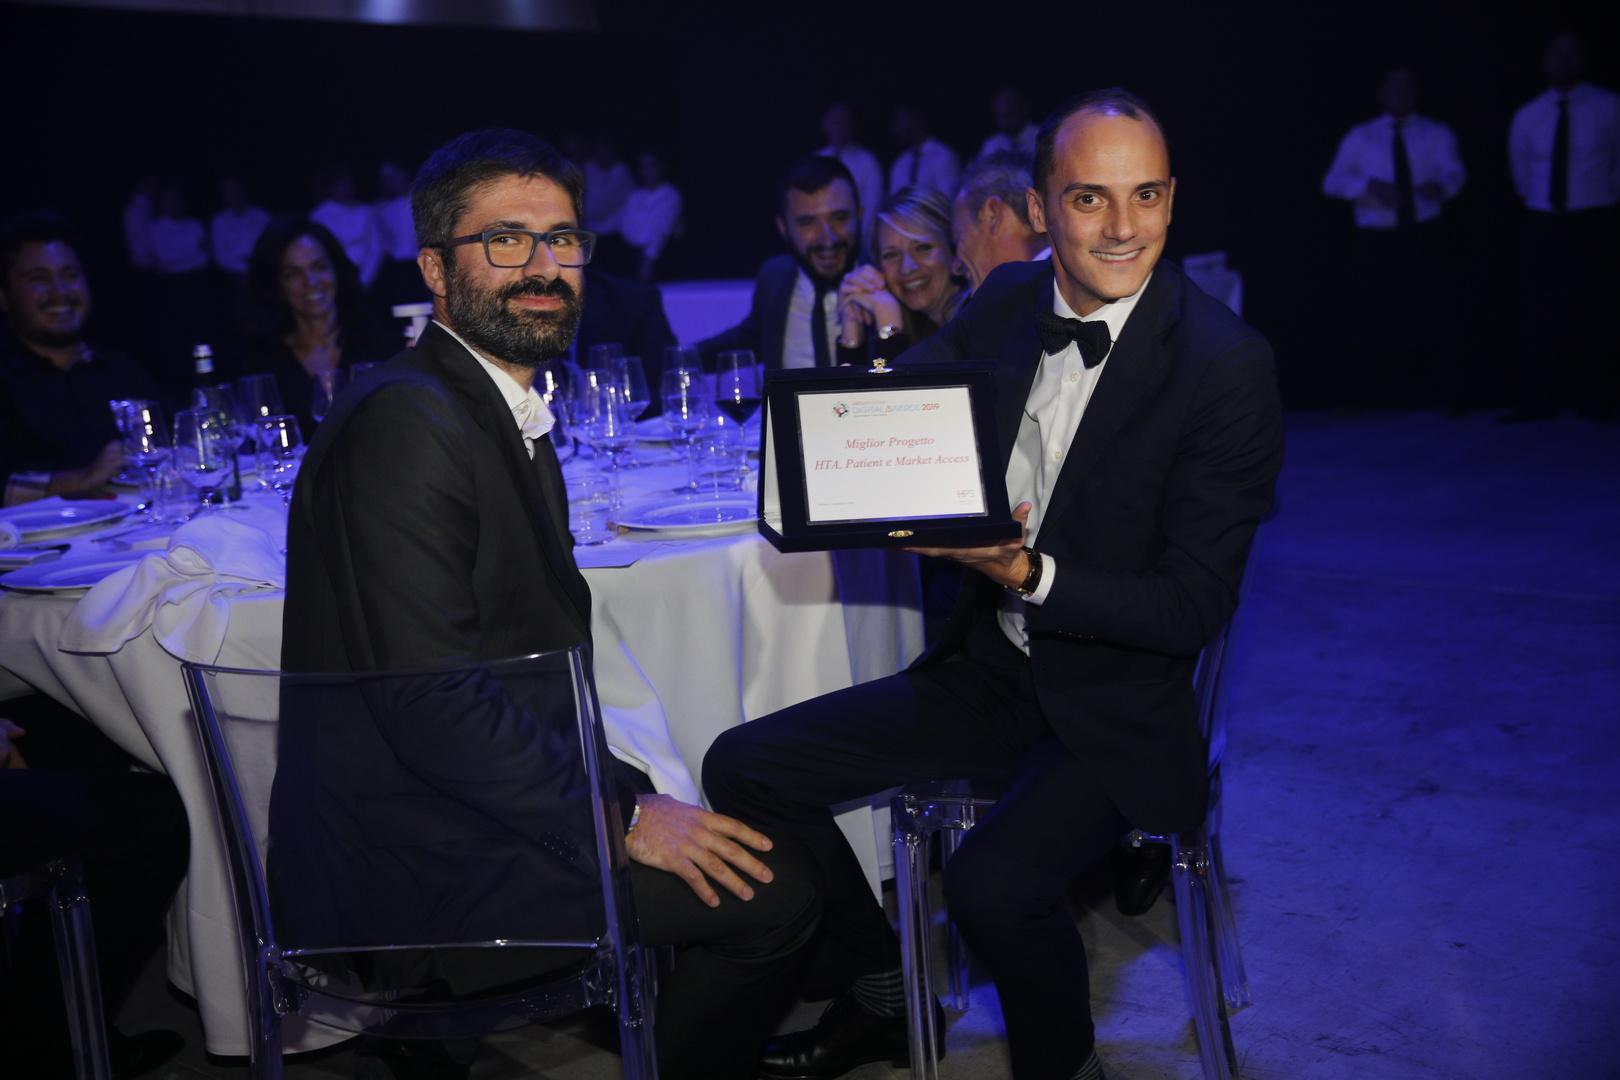 AboutPharma Digital Awards 2019 (82)